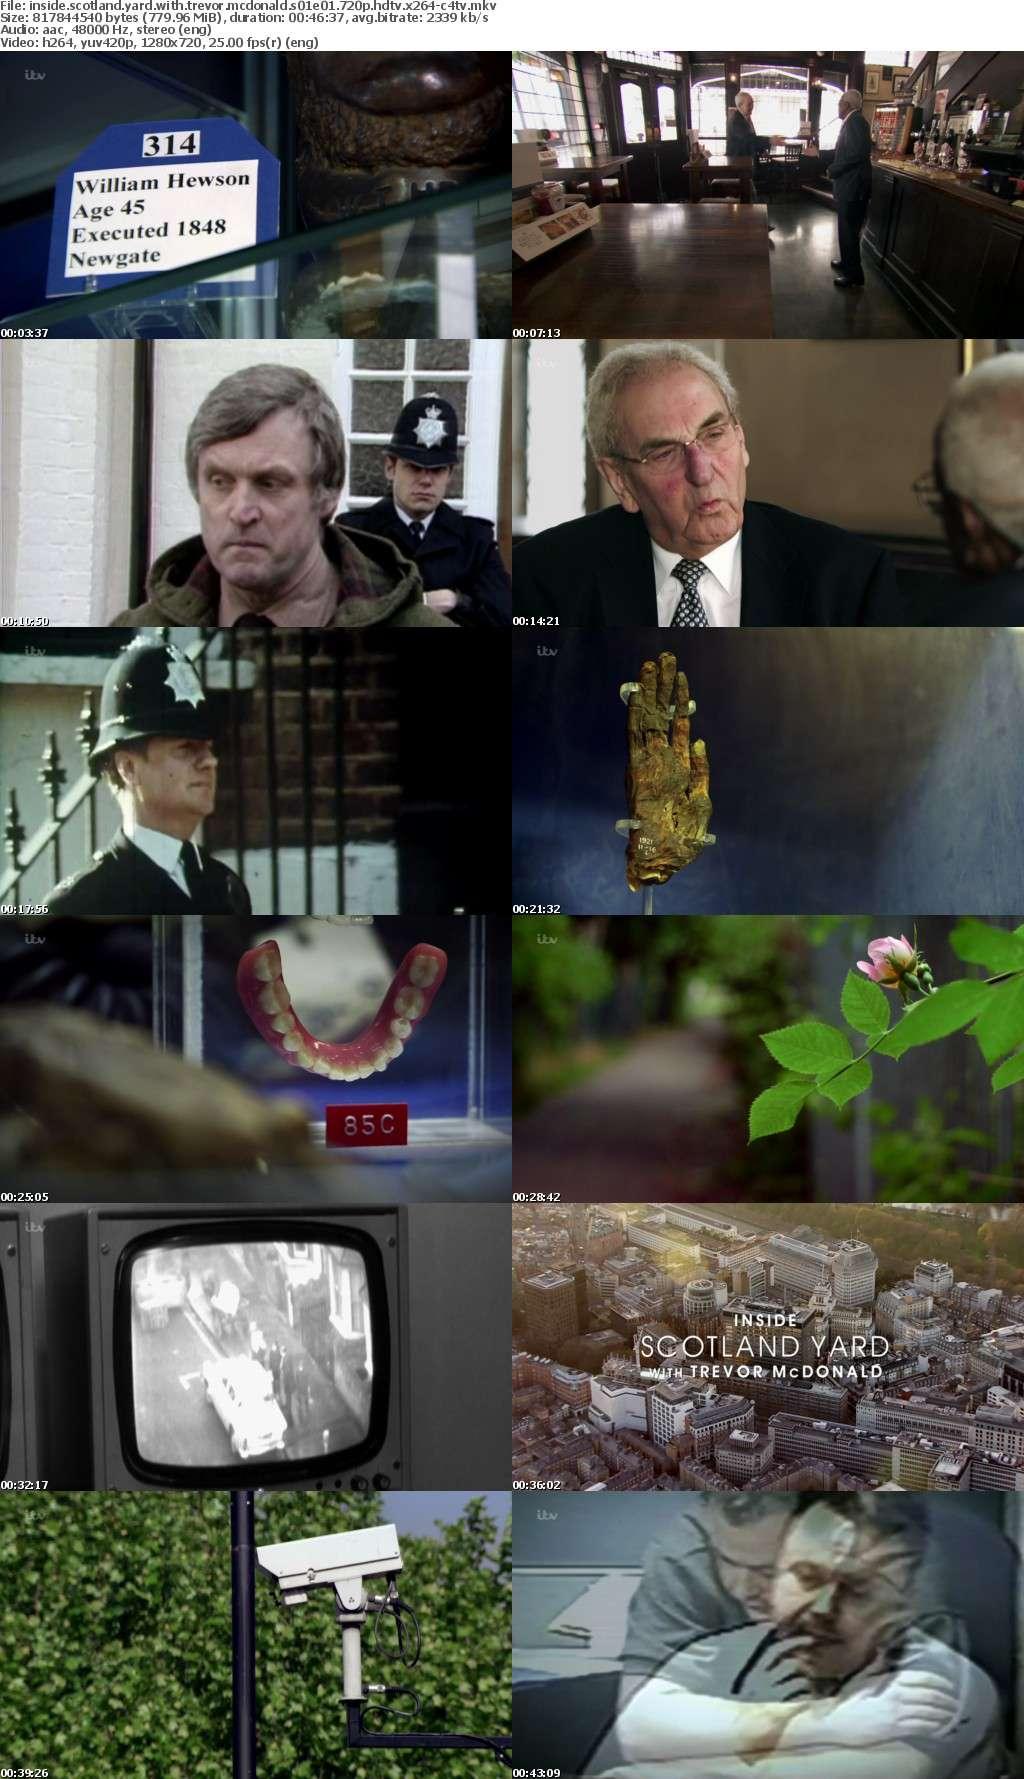 Inside Scotland Yard With Trevor Mcdonald S01E01 720p HDTV x264-C4TV